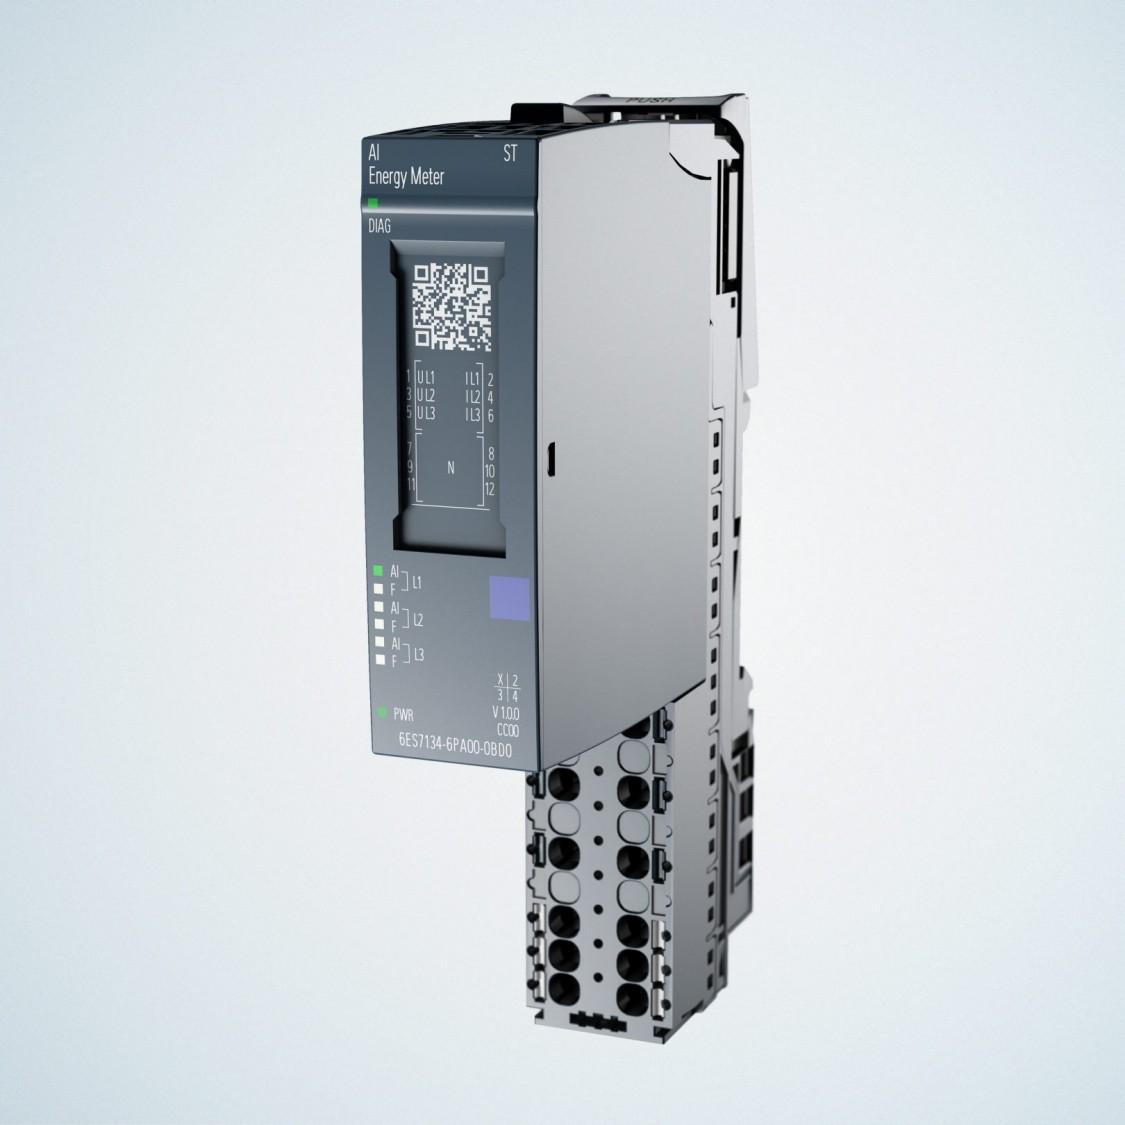 Picture SIMATIC ET 200SP Energy Meter